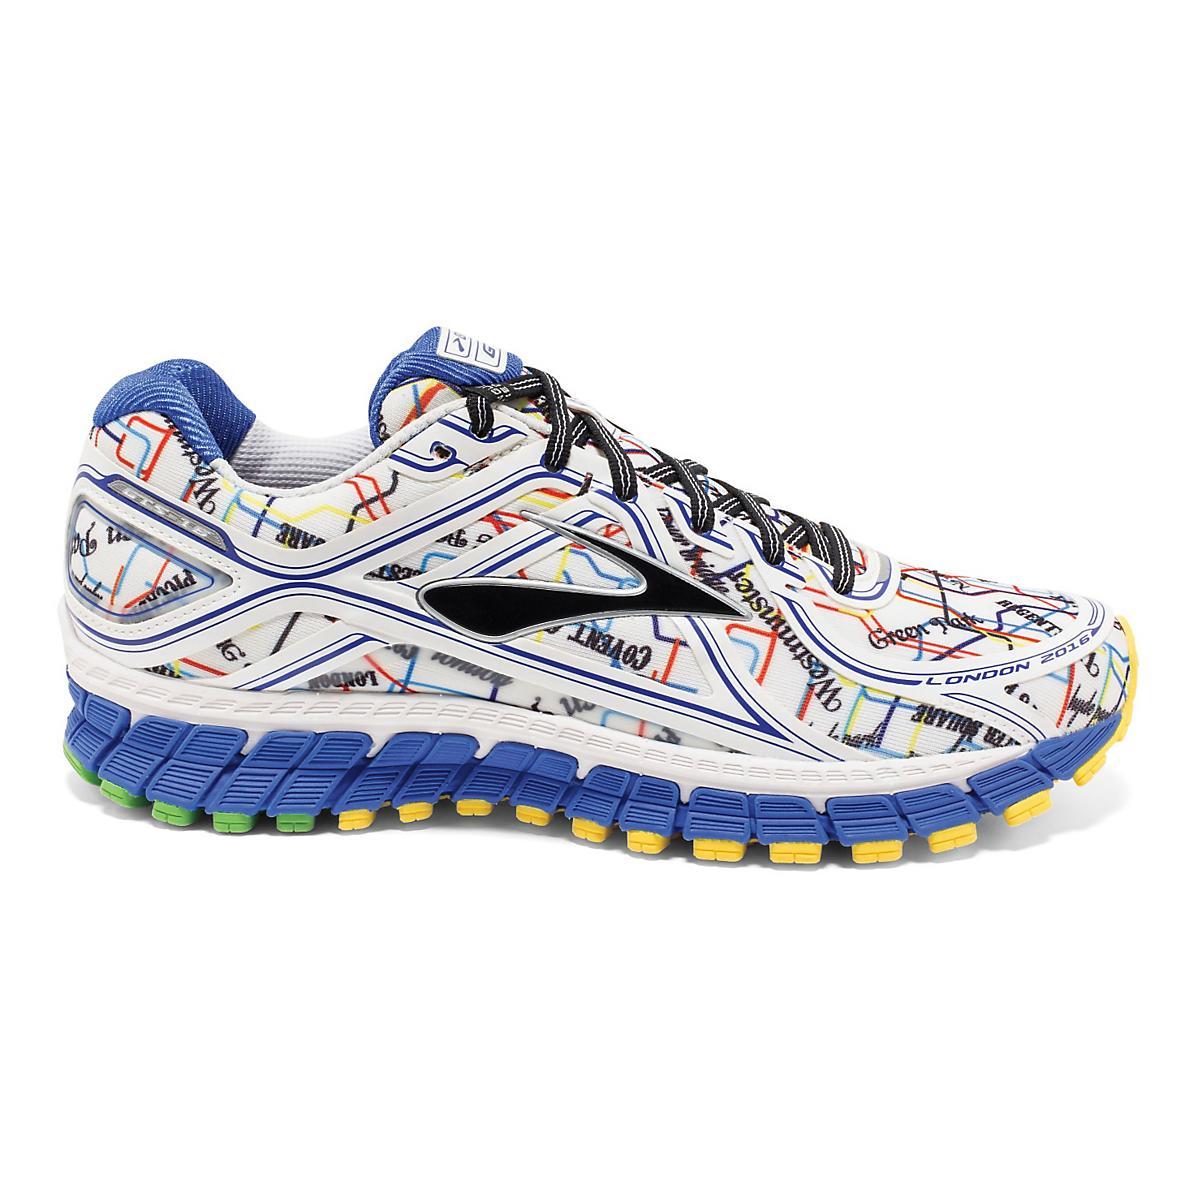 220213bec5ec7 Mens Brooks Adrenaline GTS 16 London Rapid Transit Running Shoe at Road  Runner Sports